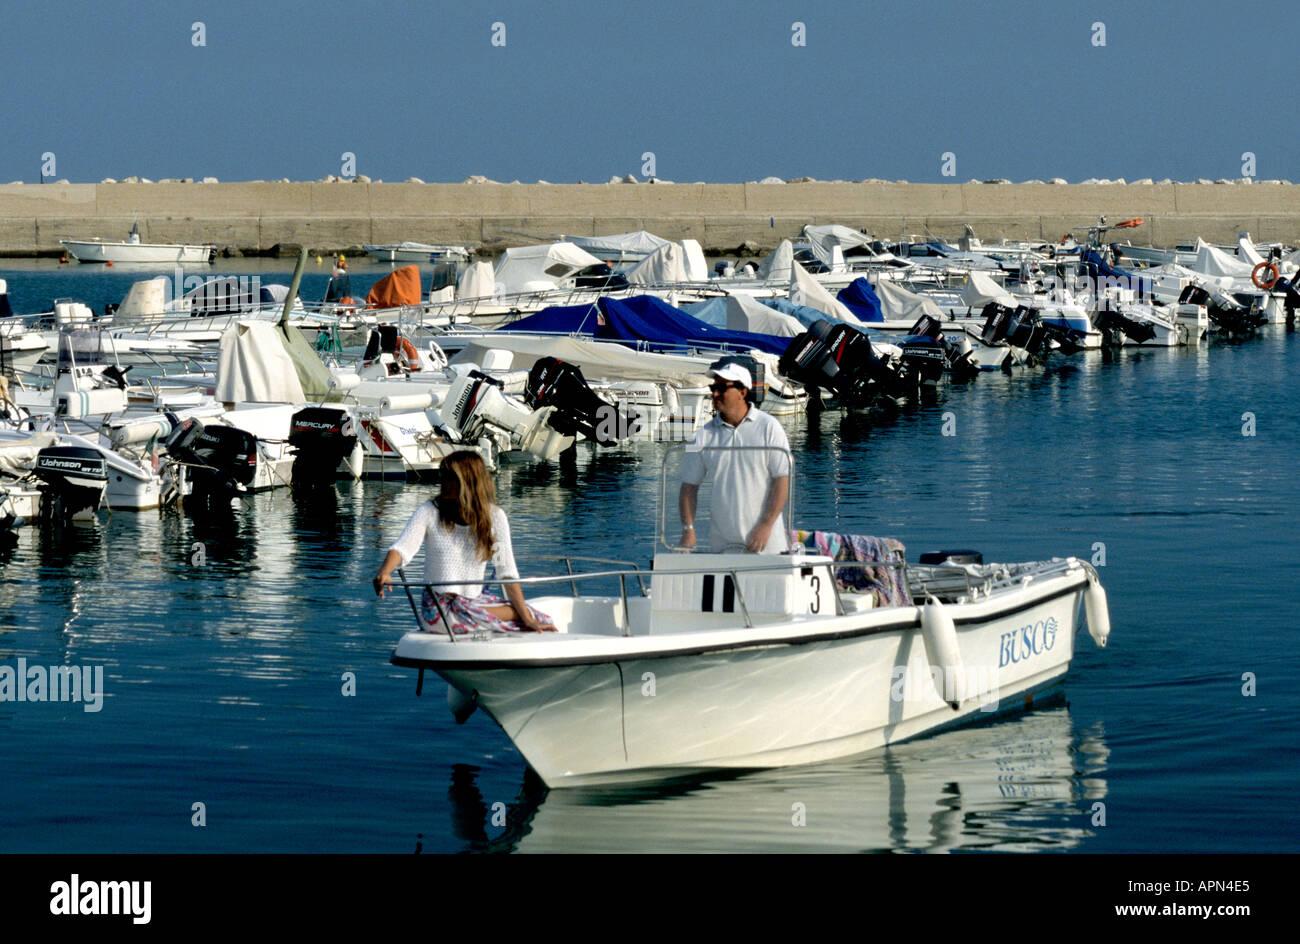 boats moored in the Conero marina in Le Marche Italy Stock Photo